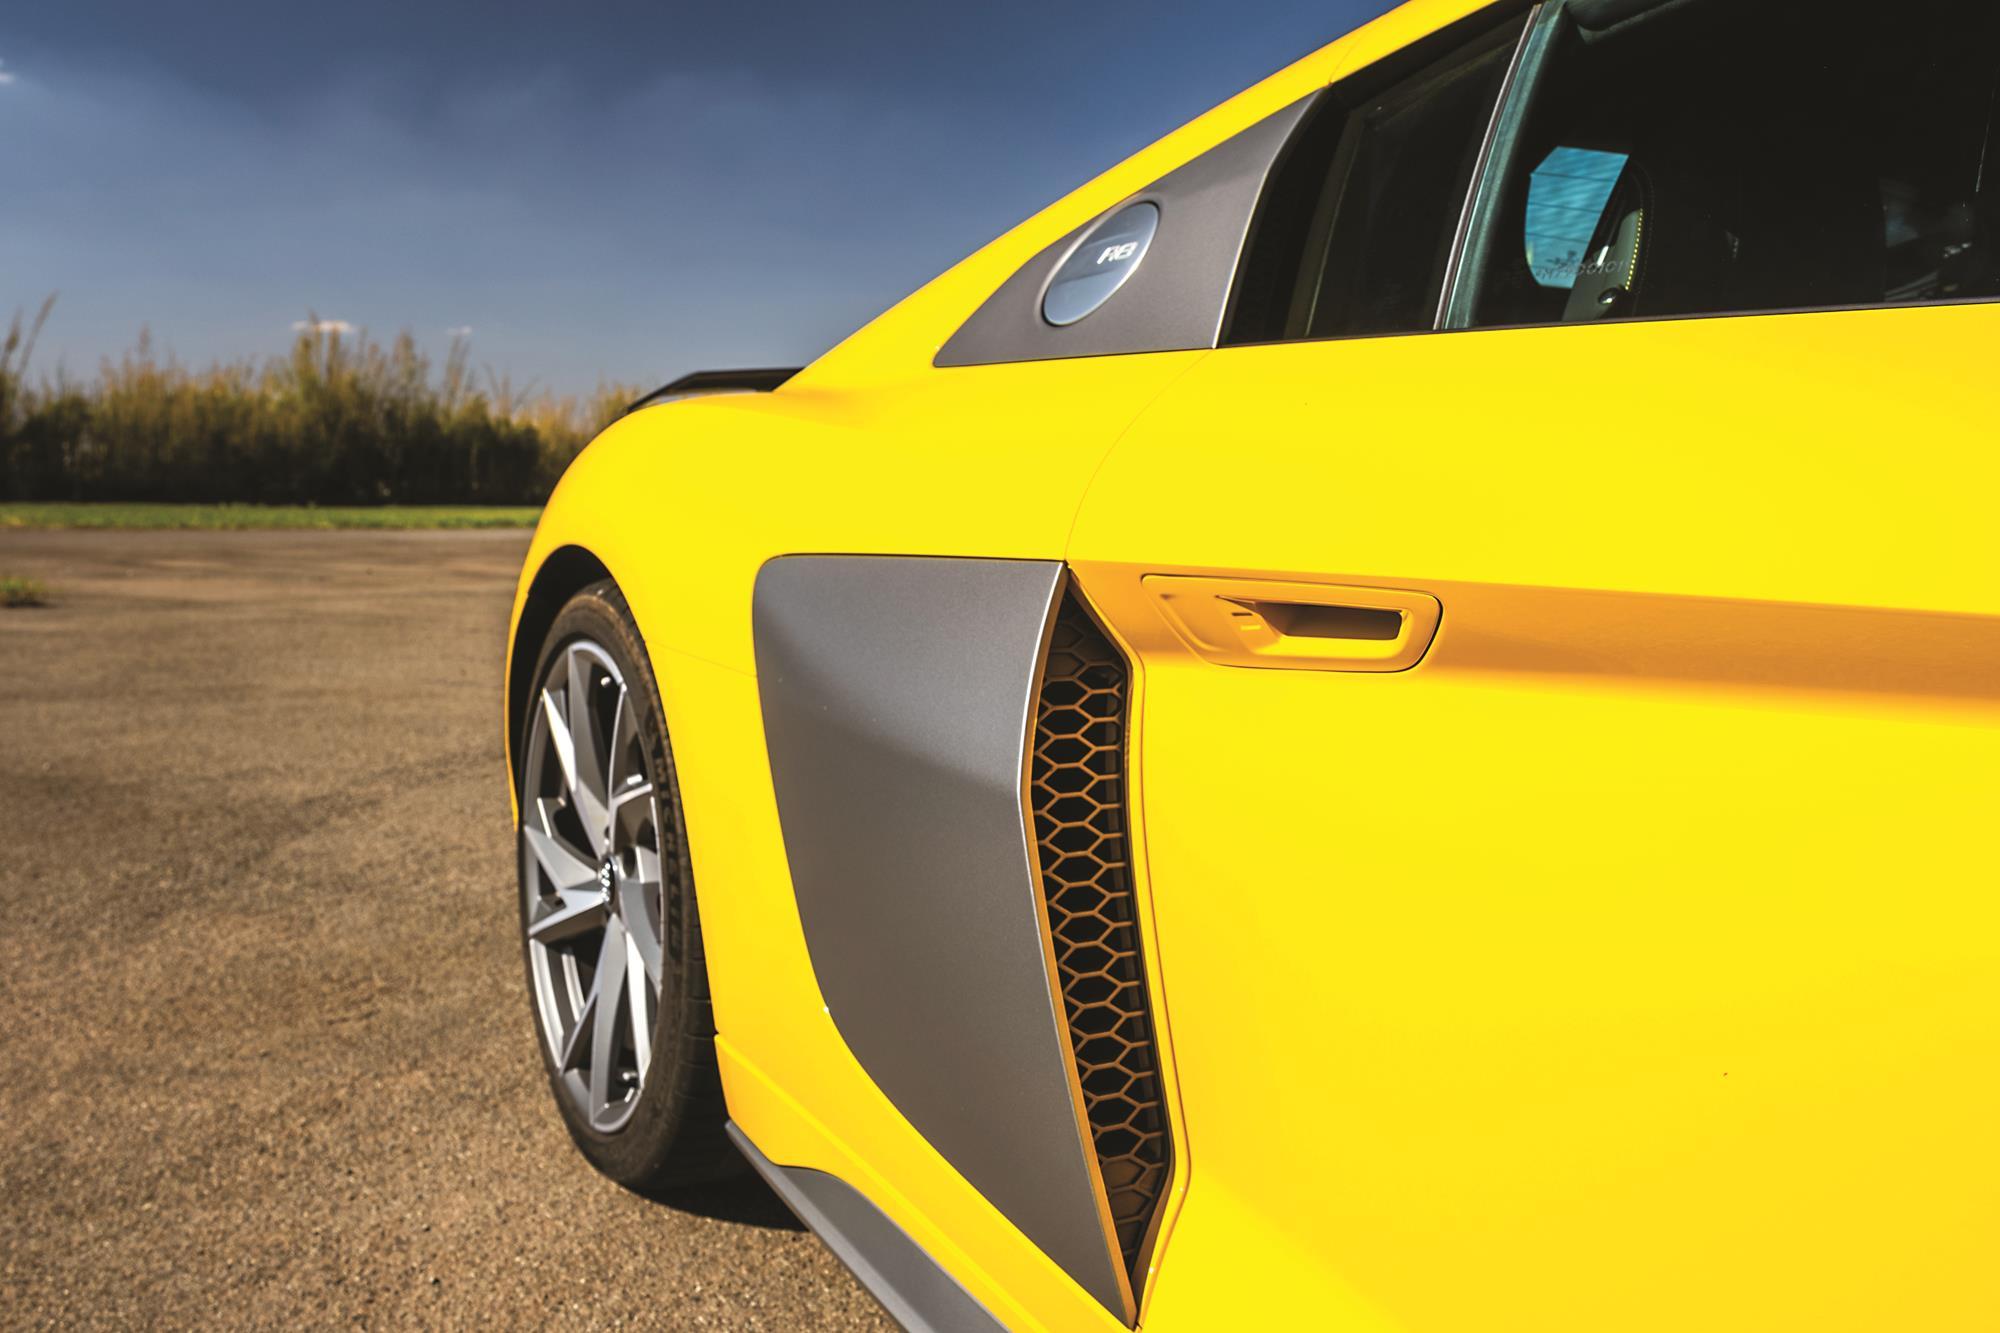 Audi R8 V10 Performance 2020 amarelo tomada de ar lateral